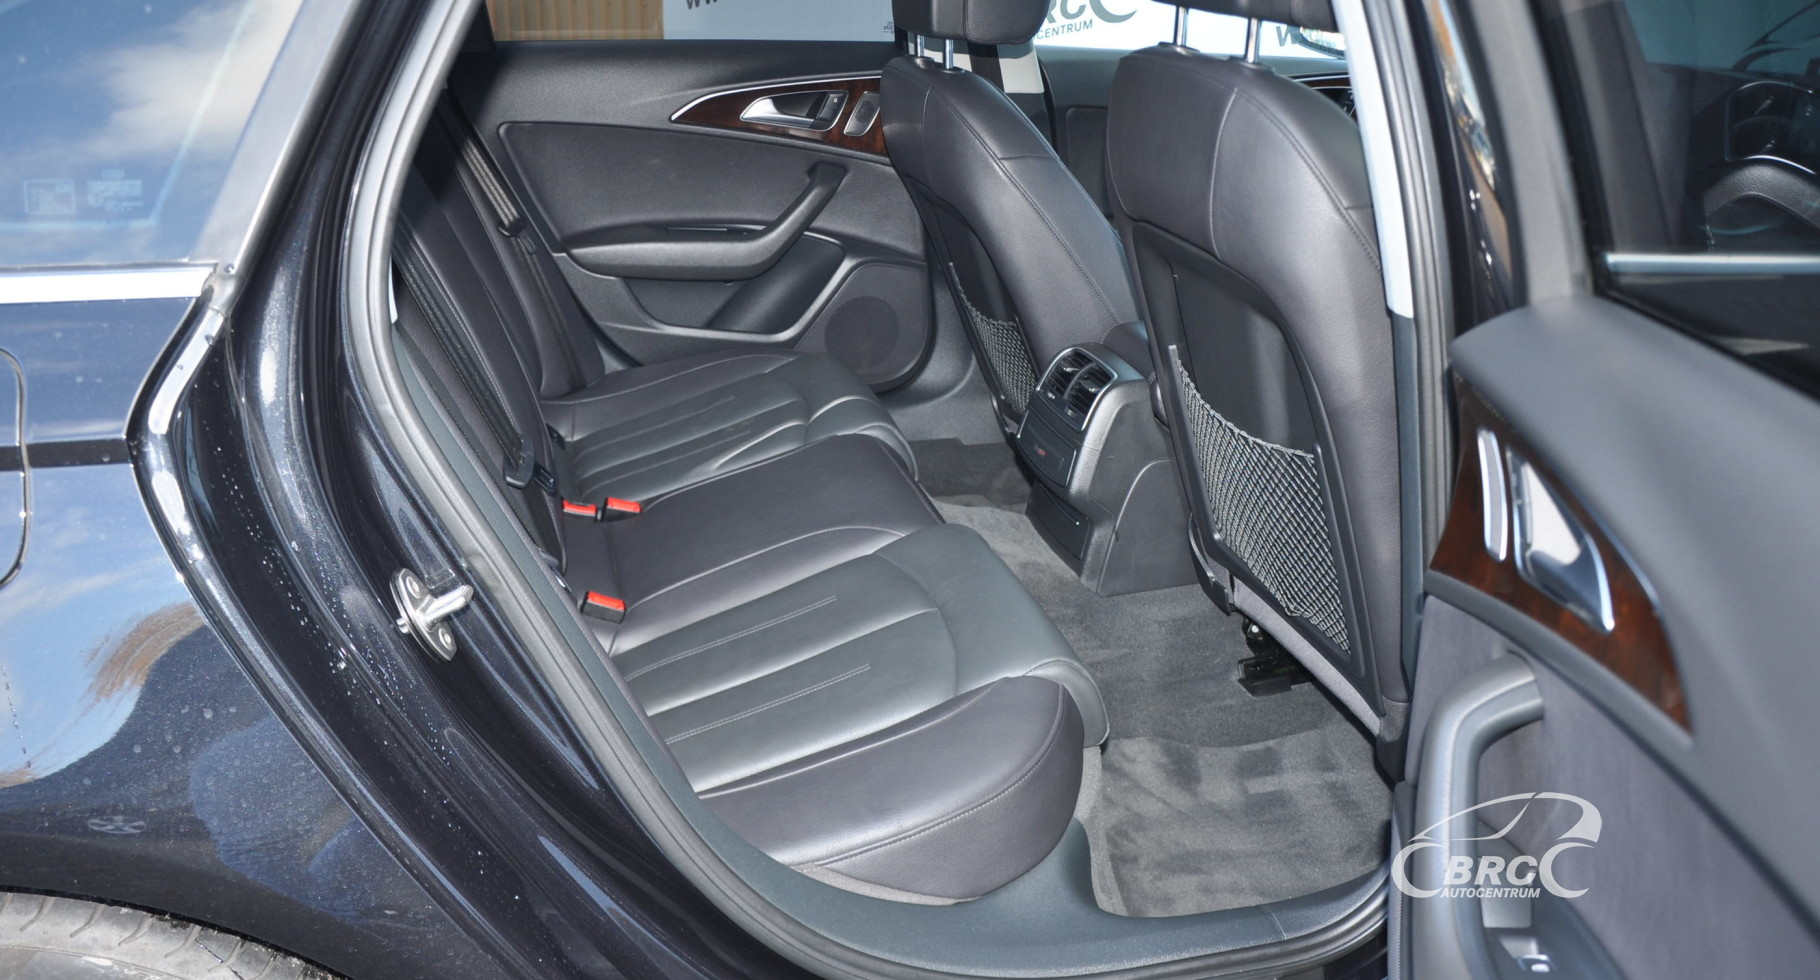 Audi A6 3.0 TFSI V6 Quattro Automatas